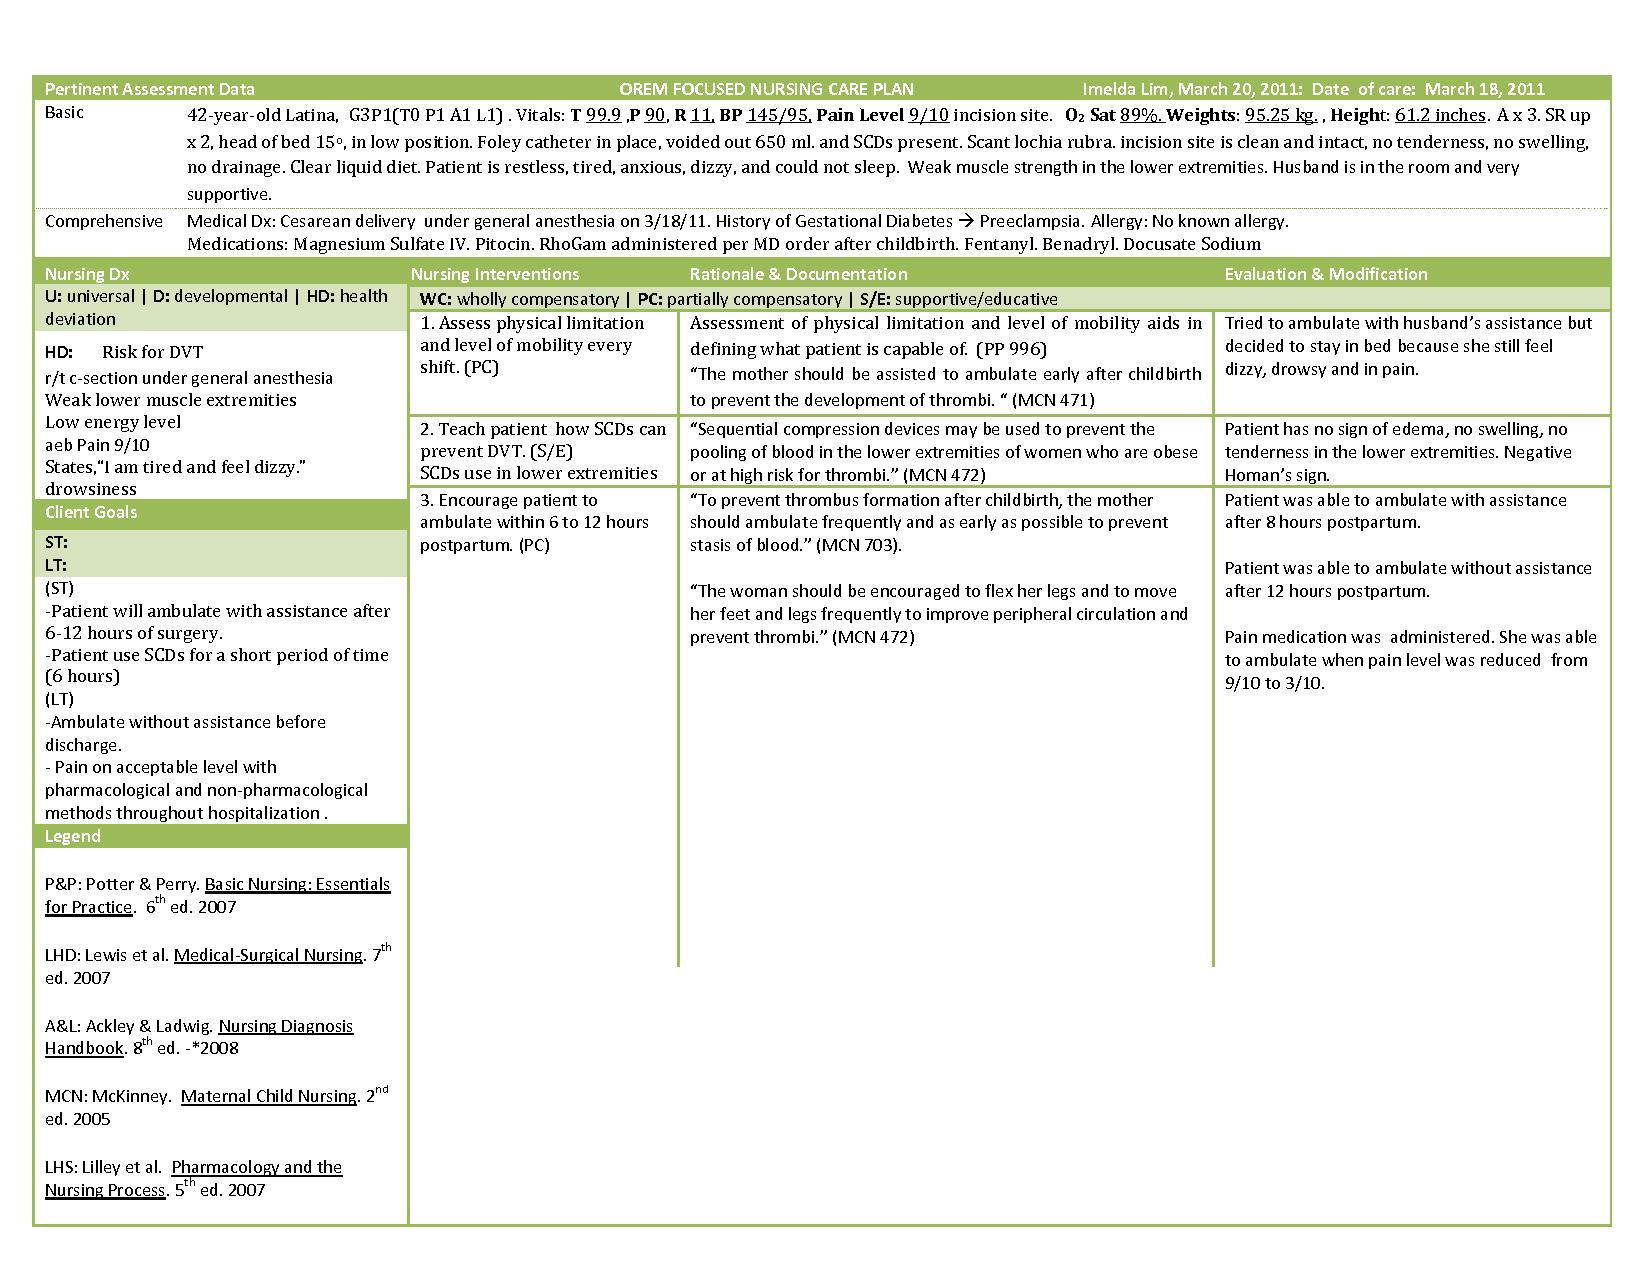 nanda nursing diagnosis dvt-pPgw « MedicineBTG.com